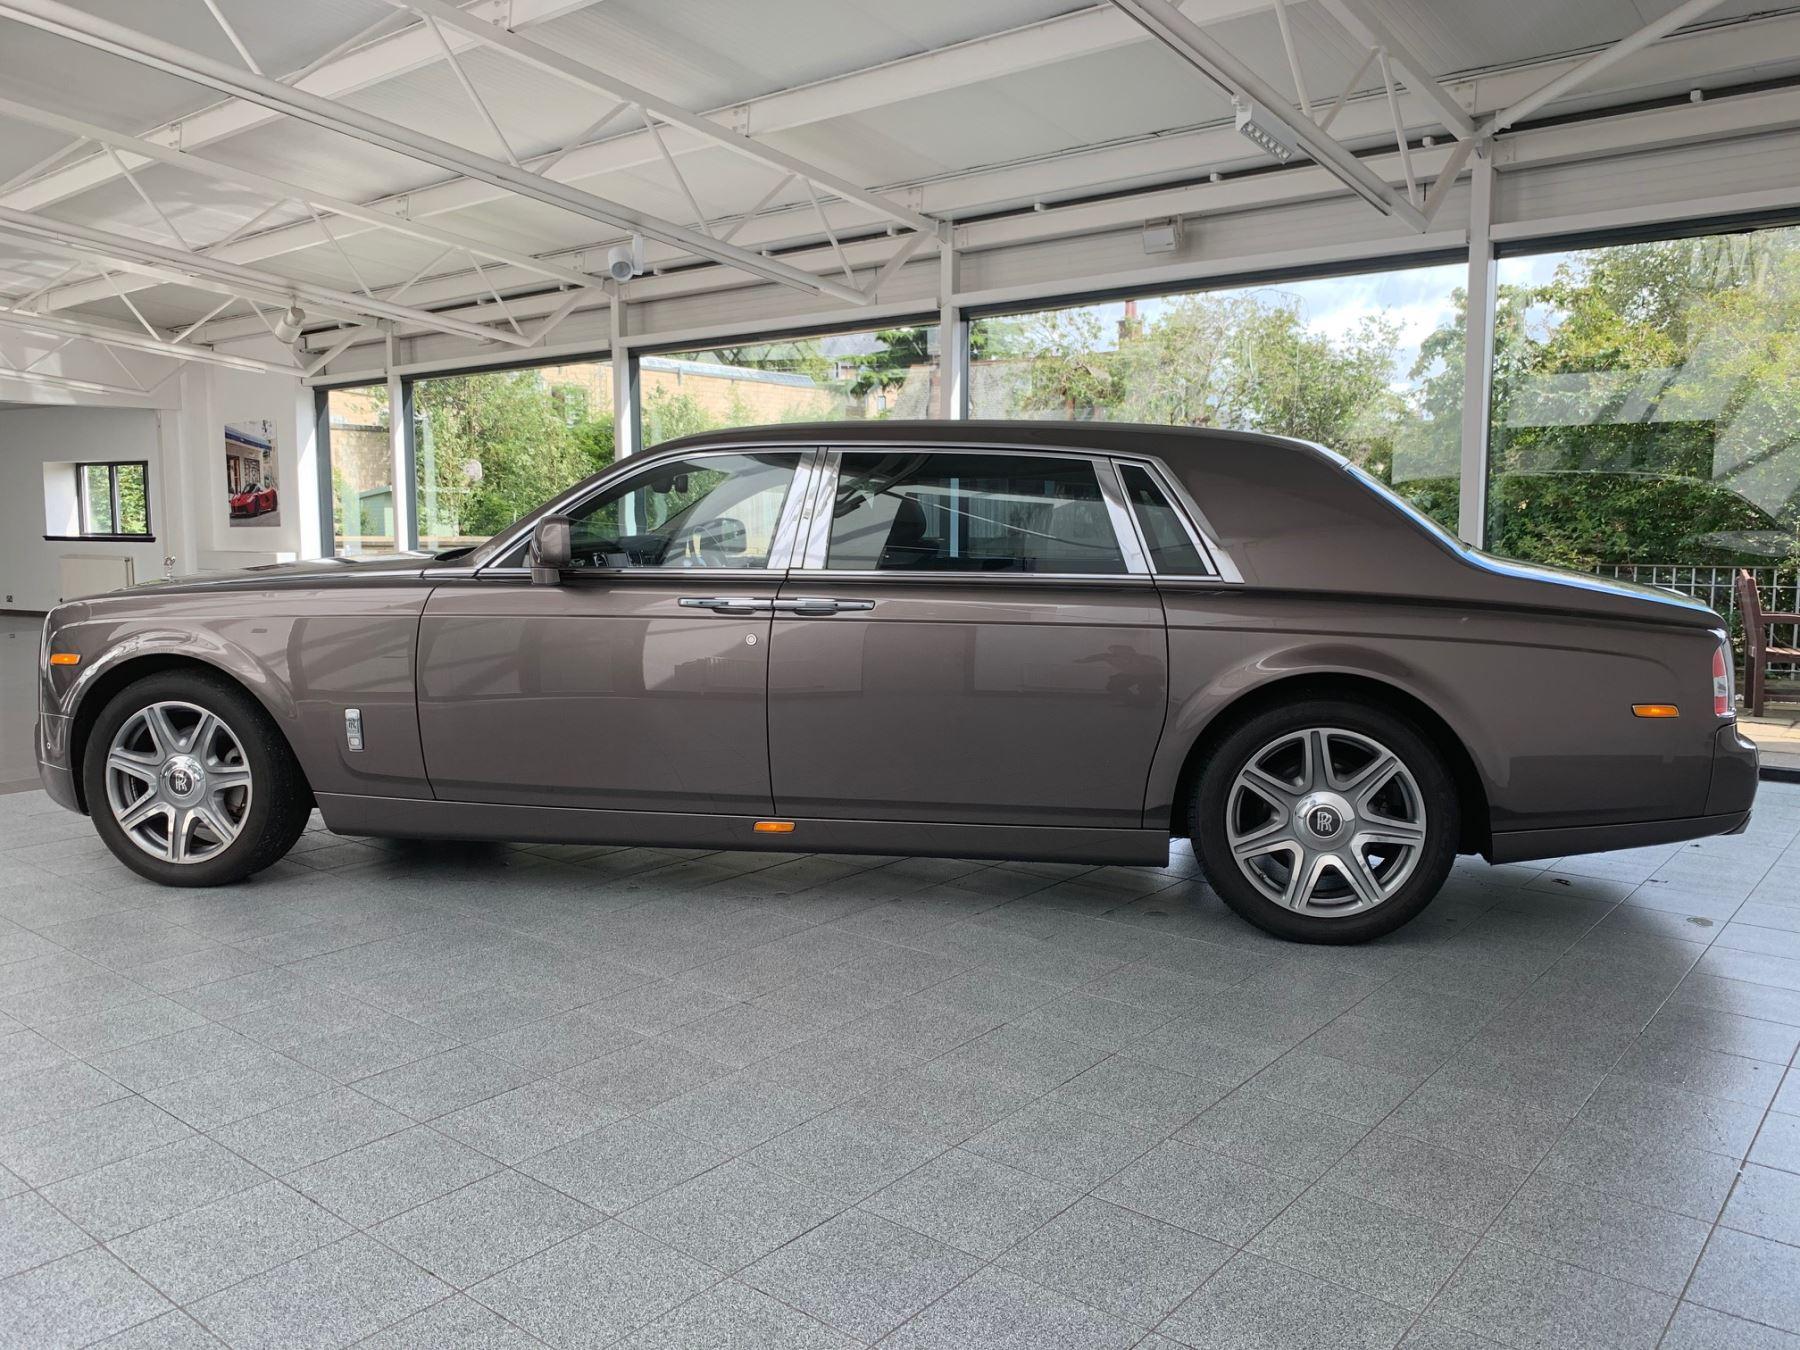 Rolls-Royce Phantom Extended Wheelbase II 4dr Auto Extended Wheel Base image 4